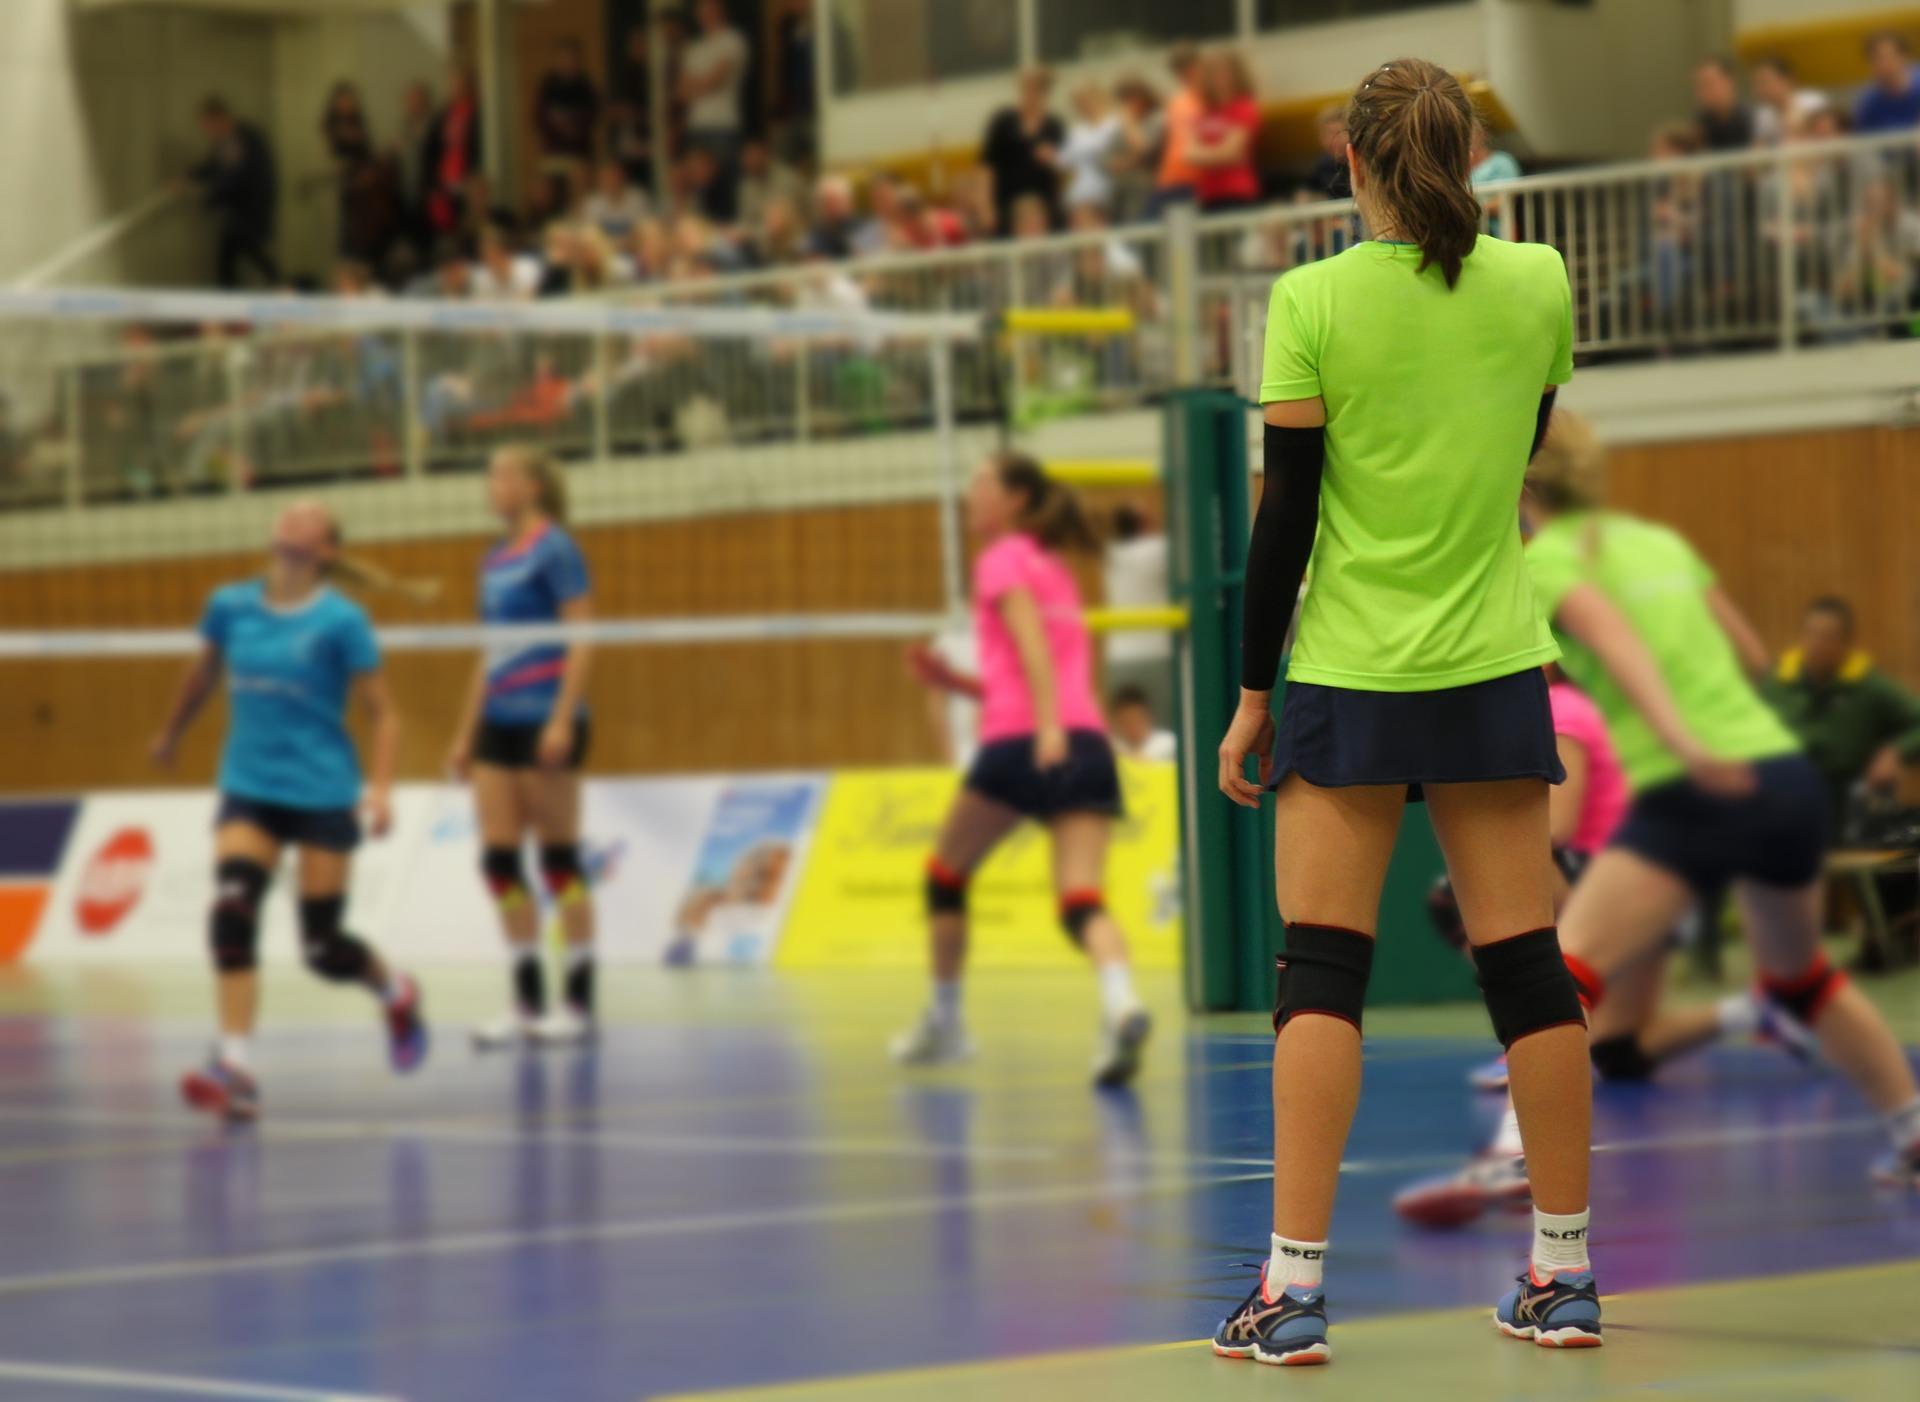 Teamsport Volleyball